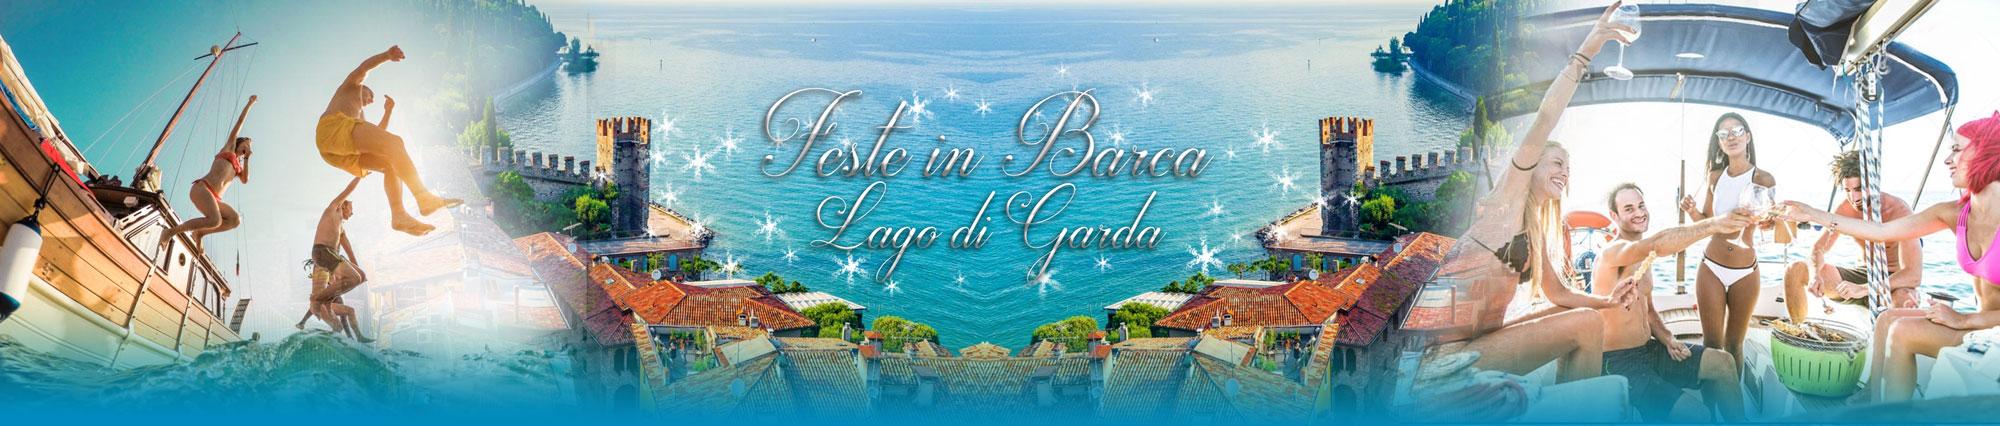 feste-in-barca-lago-di-garda